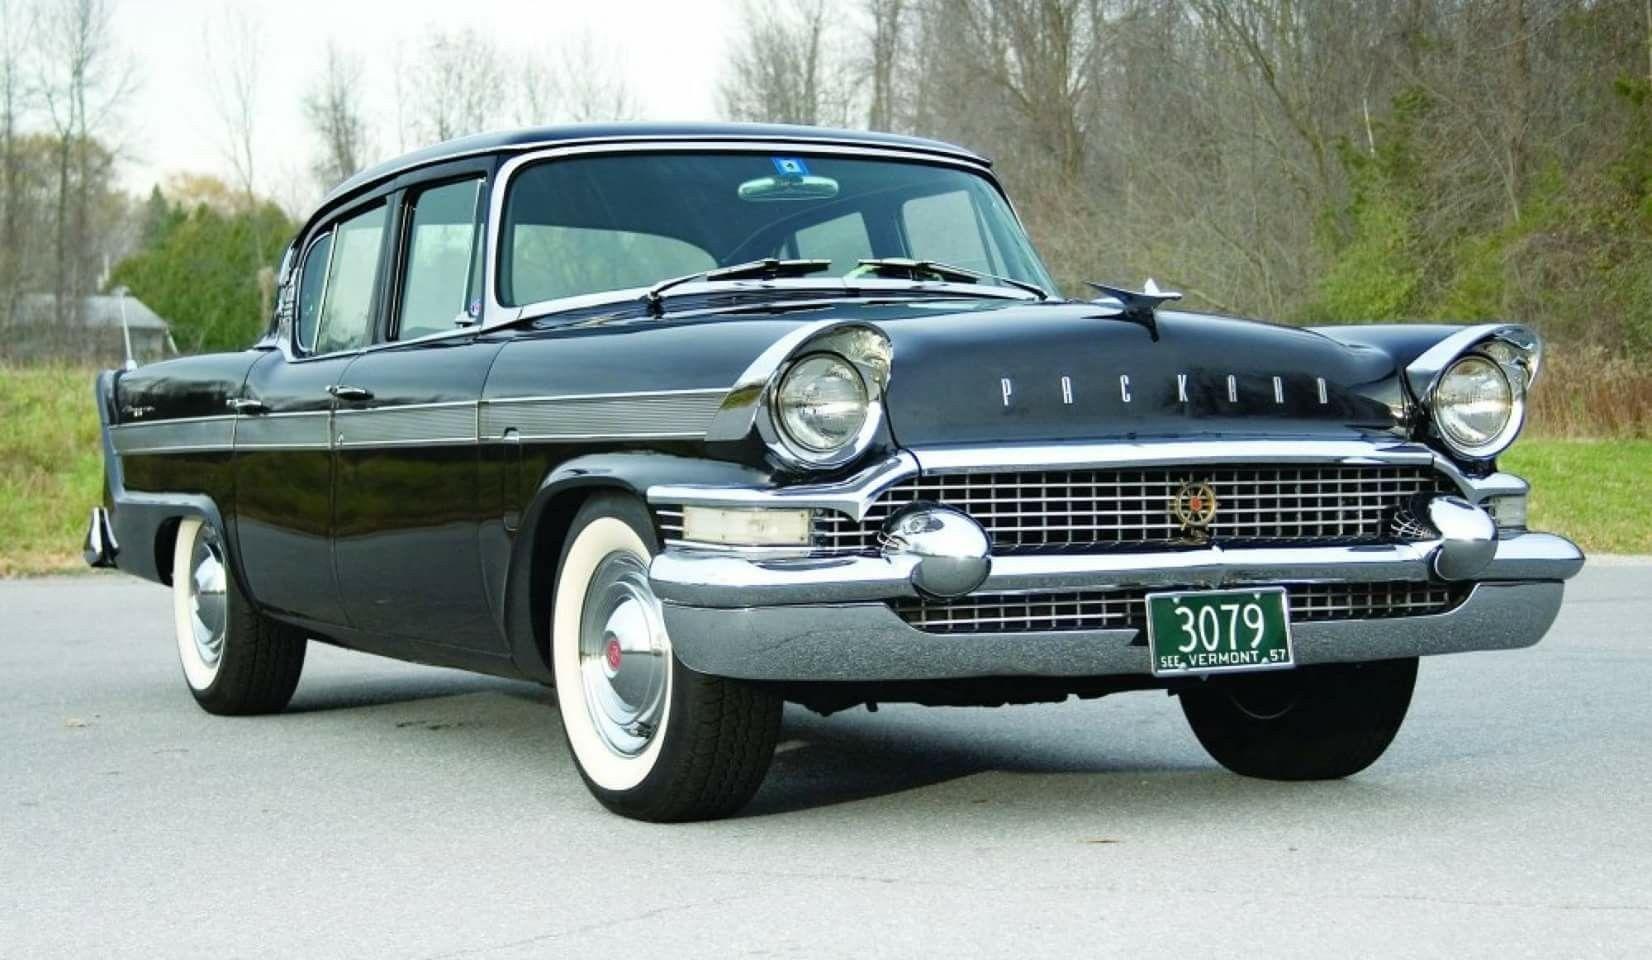 1957 Packard Clipper | Cars | Pinterest | Cars, Car stuff and Wheels